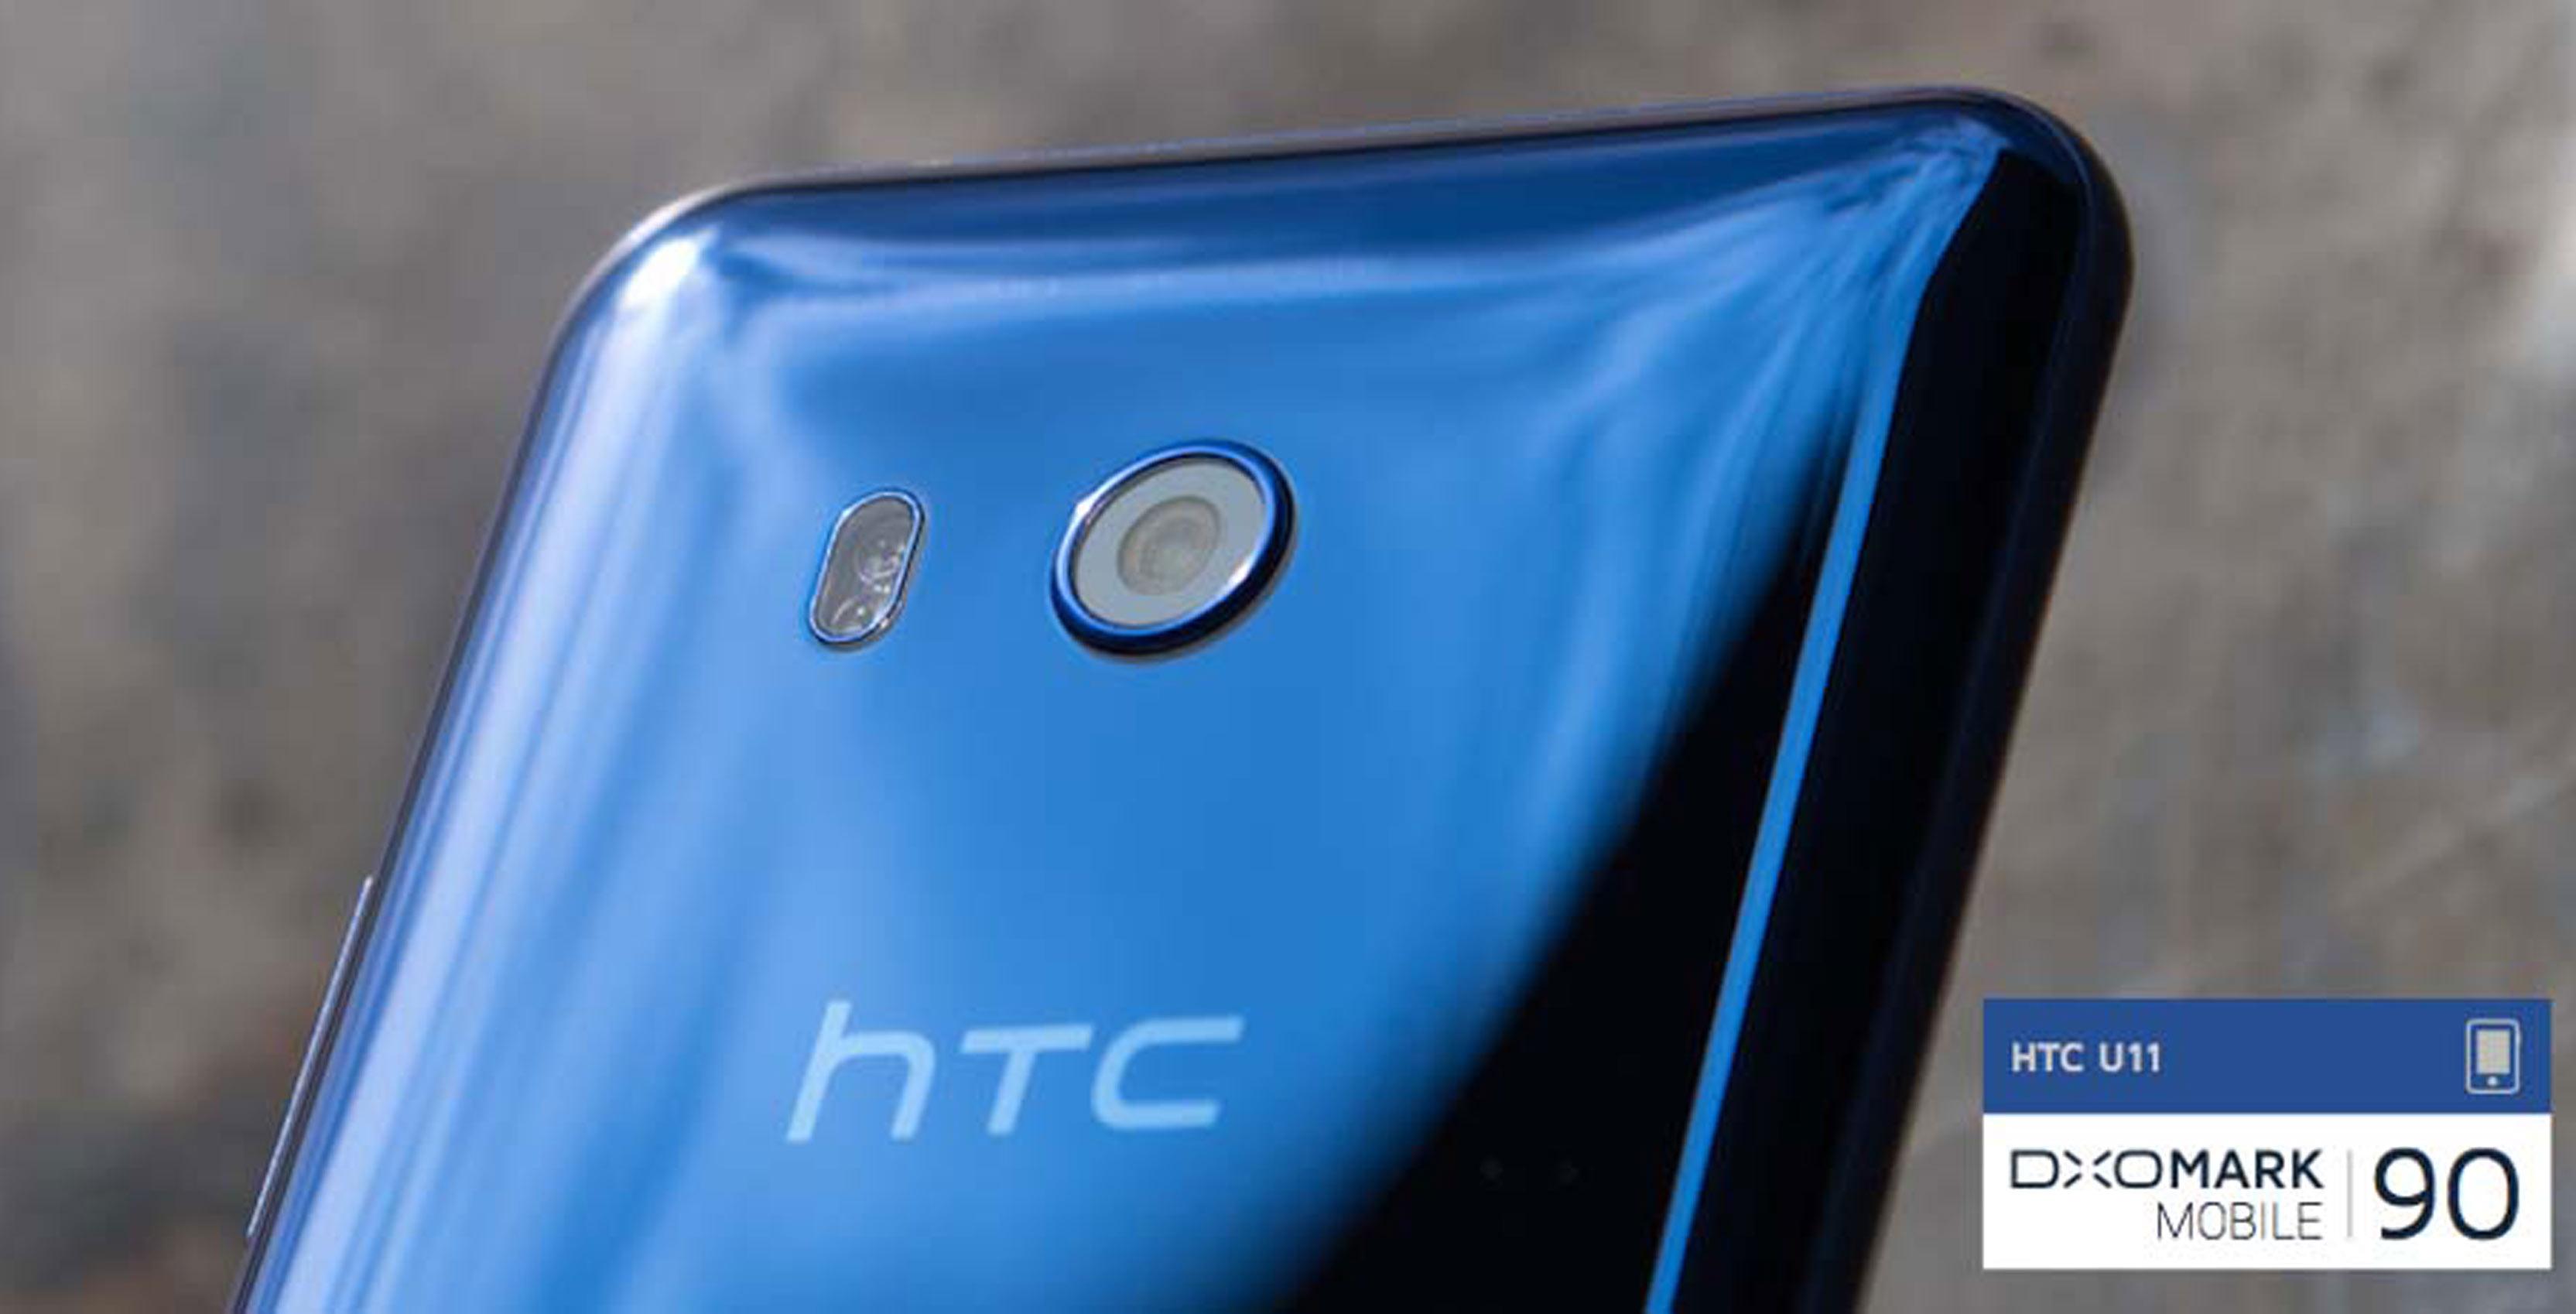 HTC U11 rear facing camera